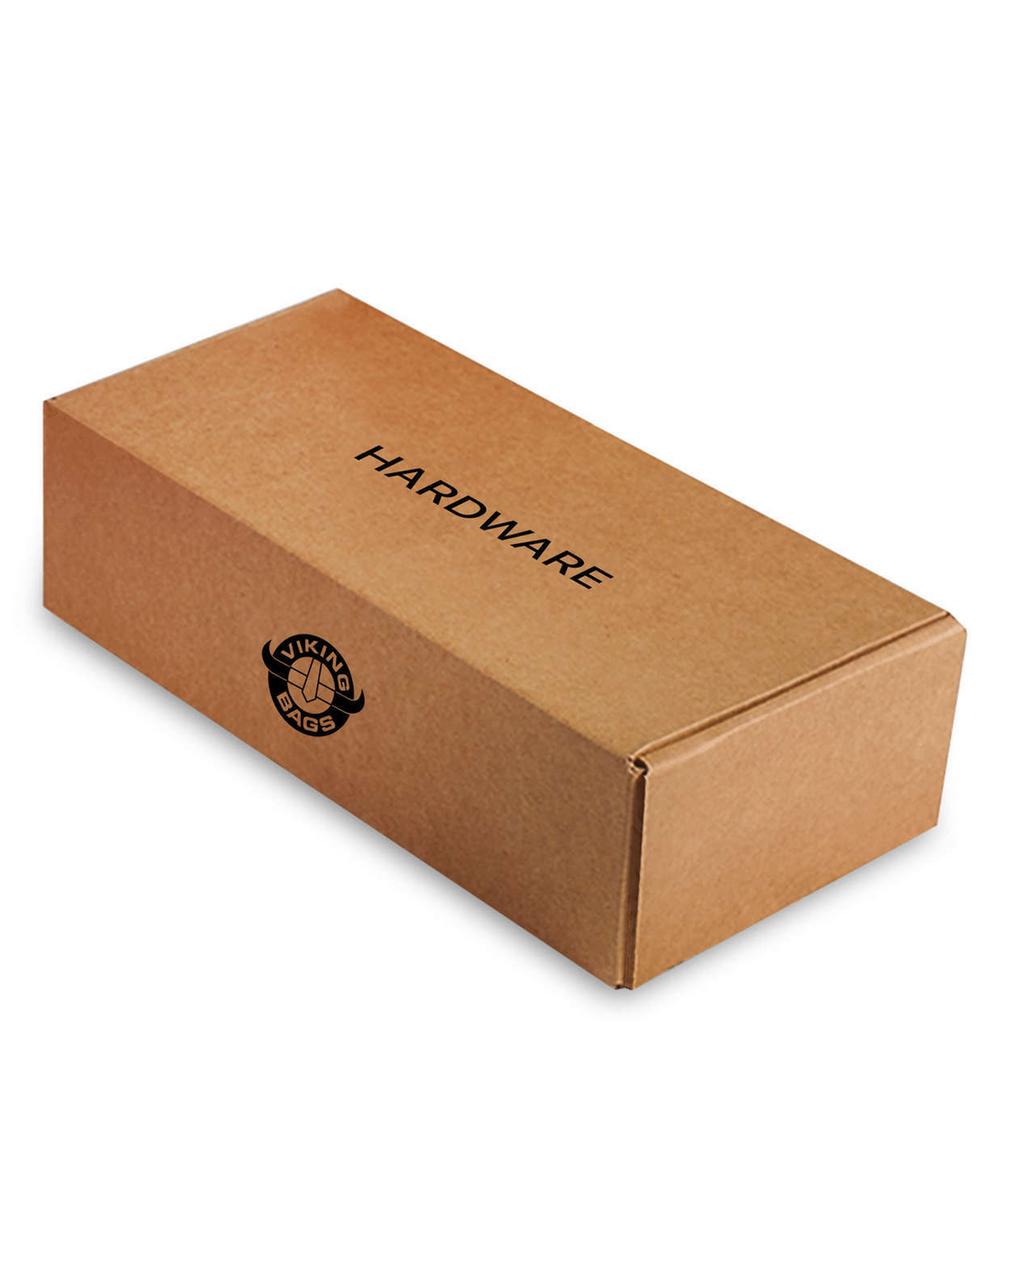 Boulevard C90, VL1500 Medium Slanted Saddlebags Hardware Box